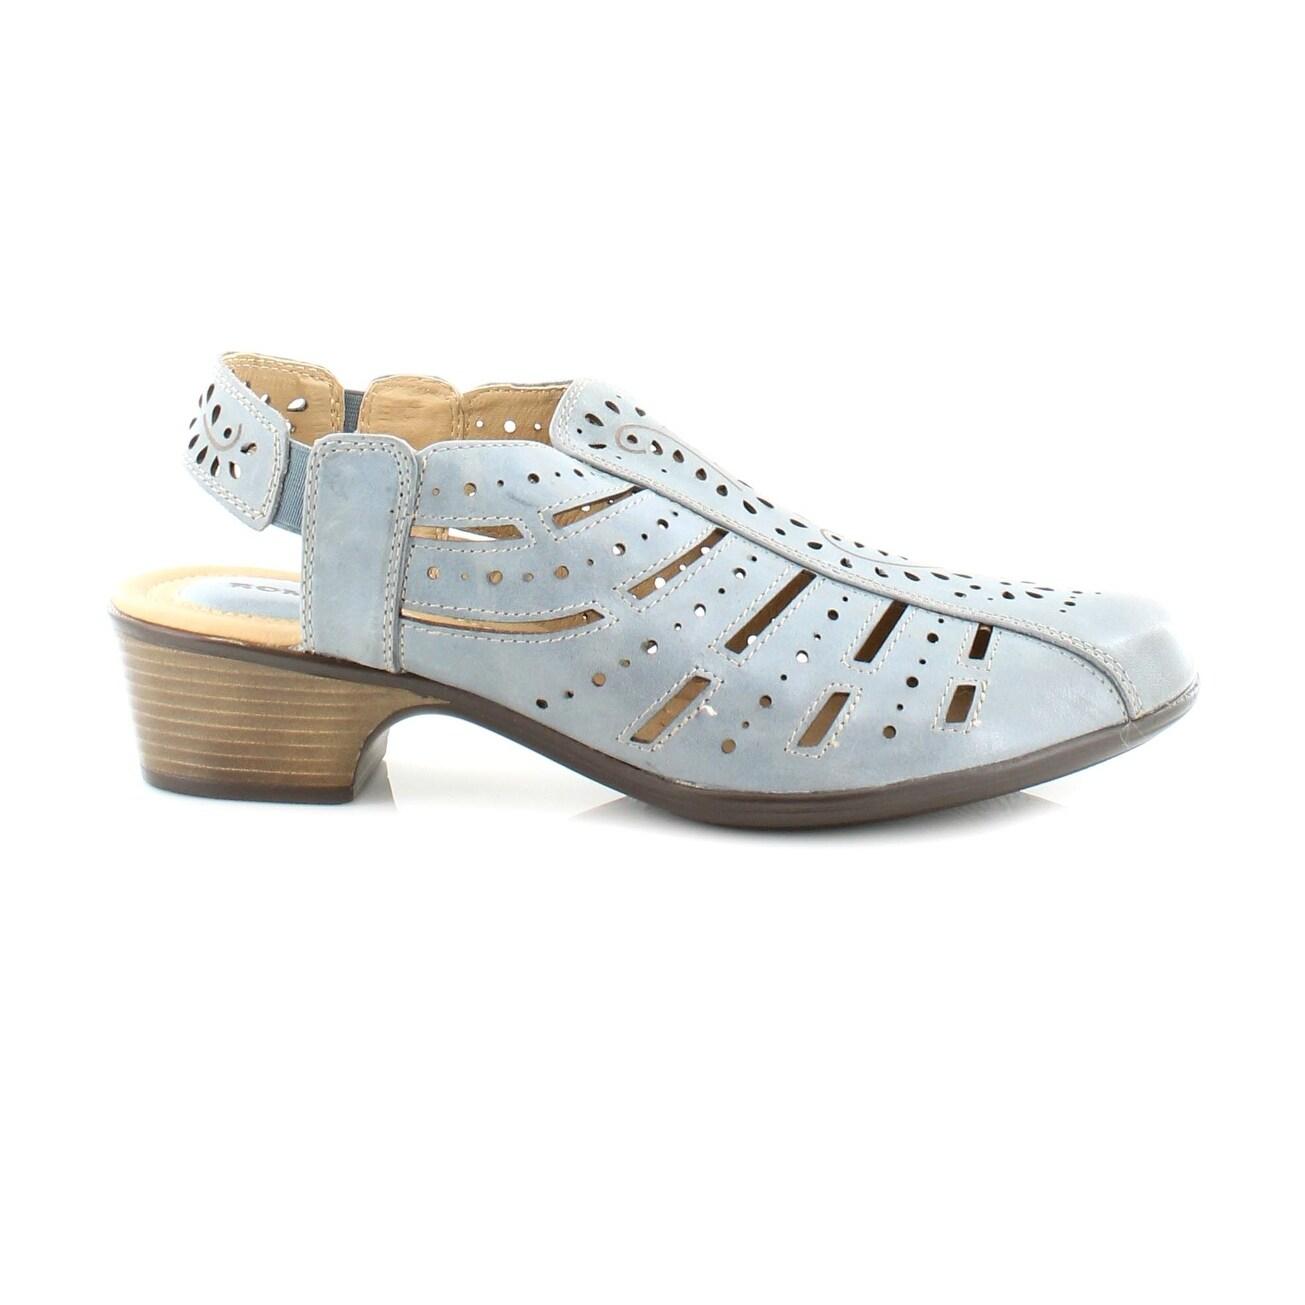 3933002051f Romika Barbados Women's Sandals & Flip Flops Azur